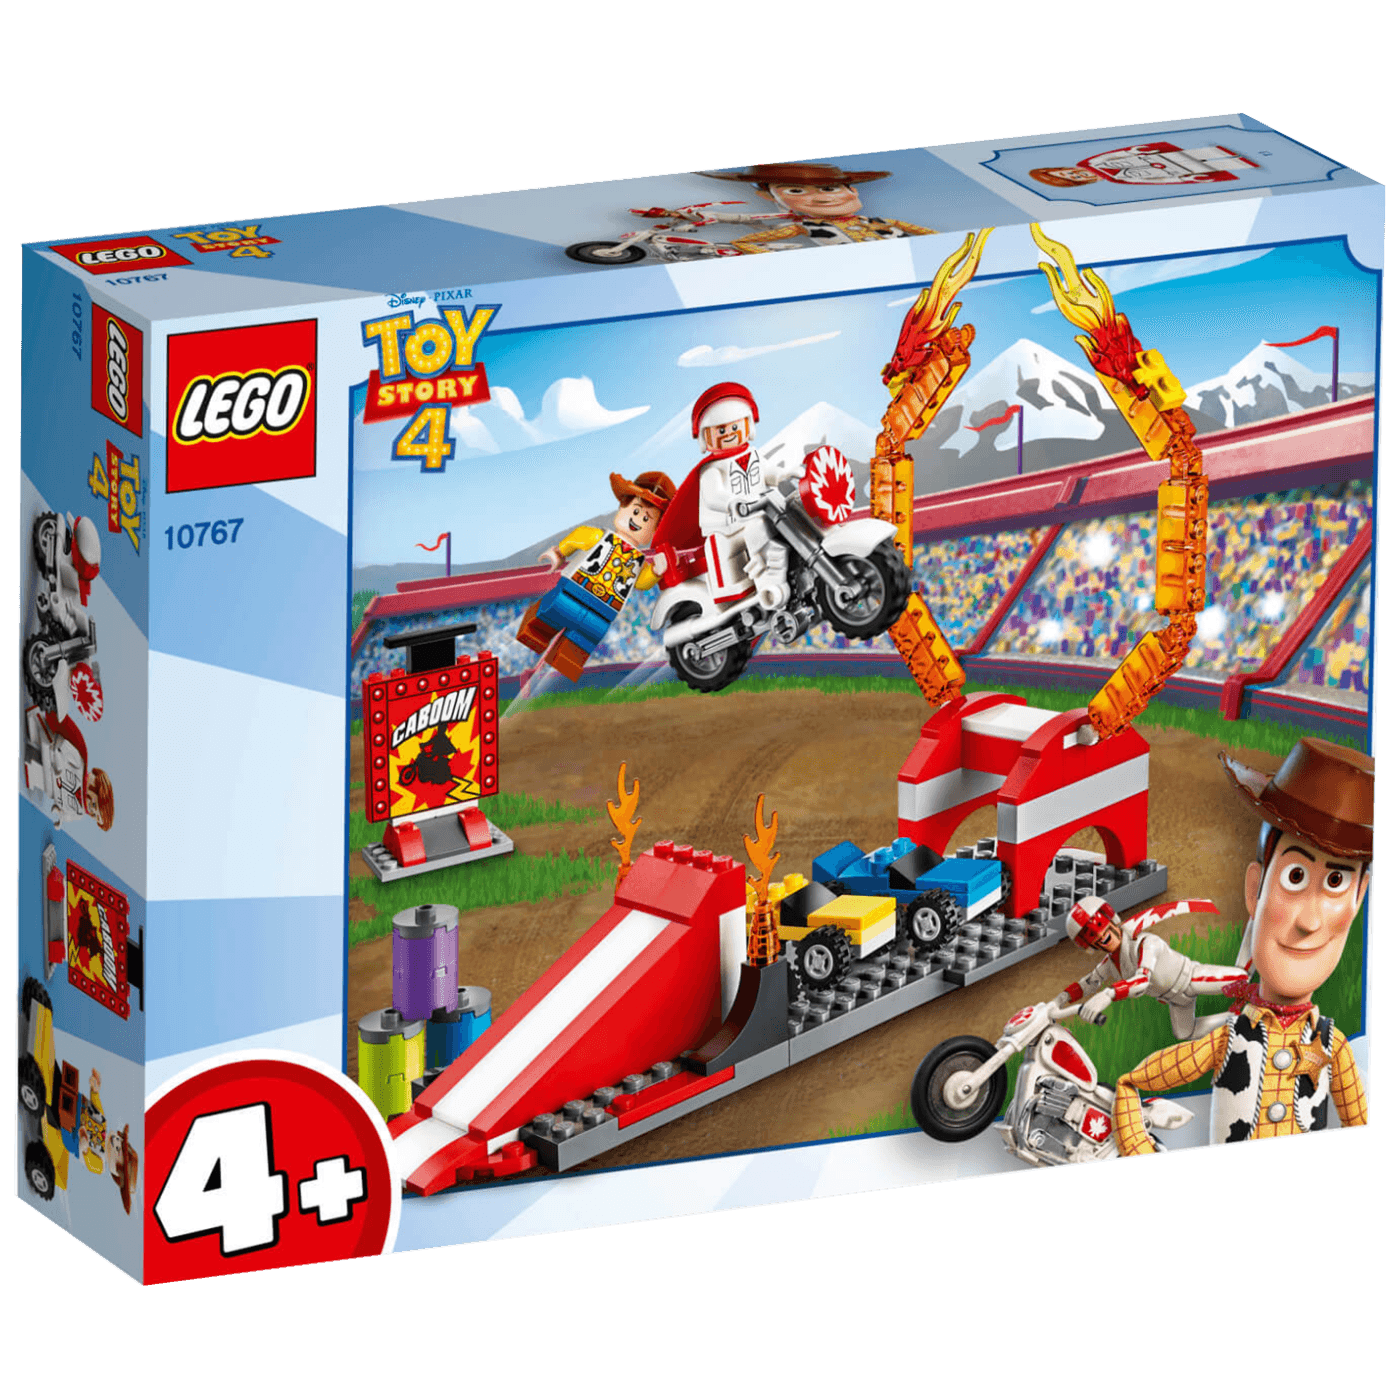 Lego - Duke Caboom